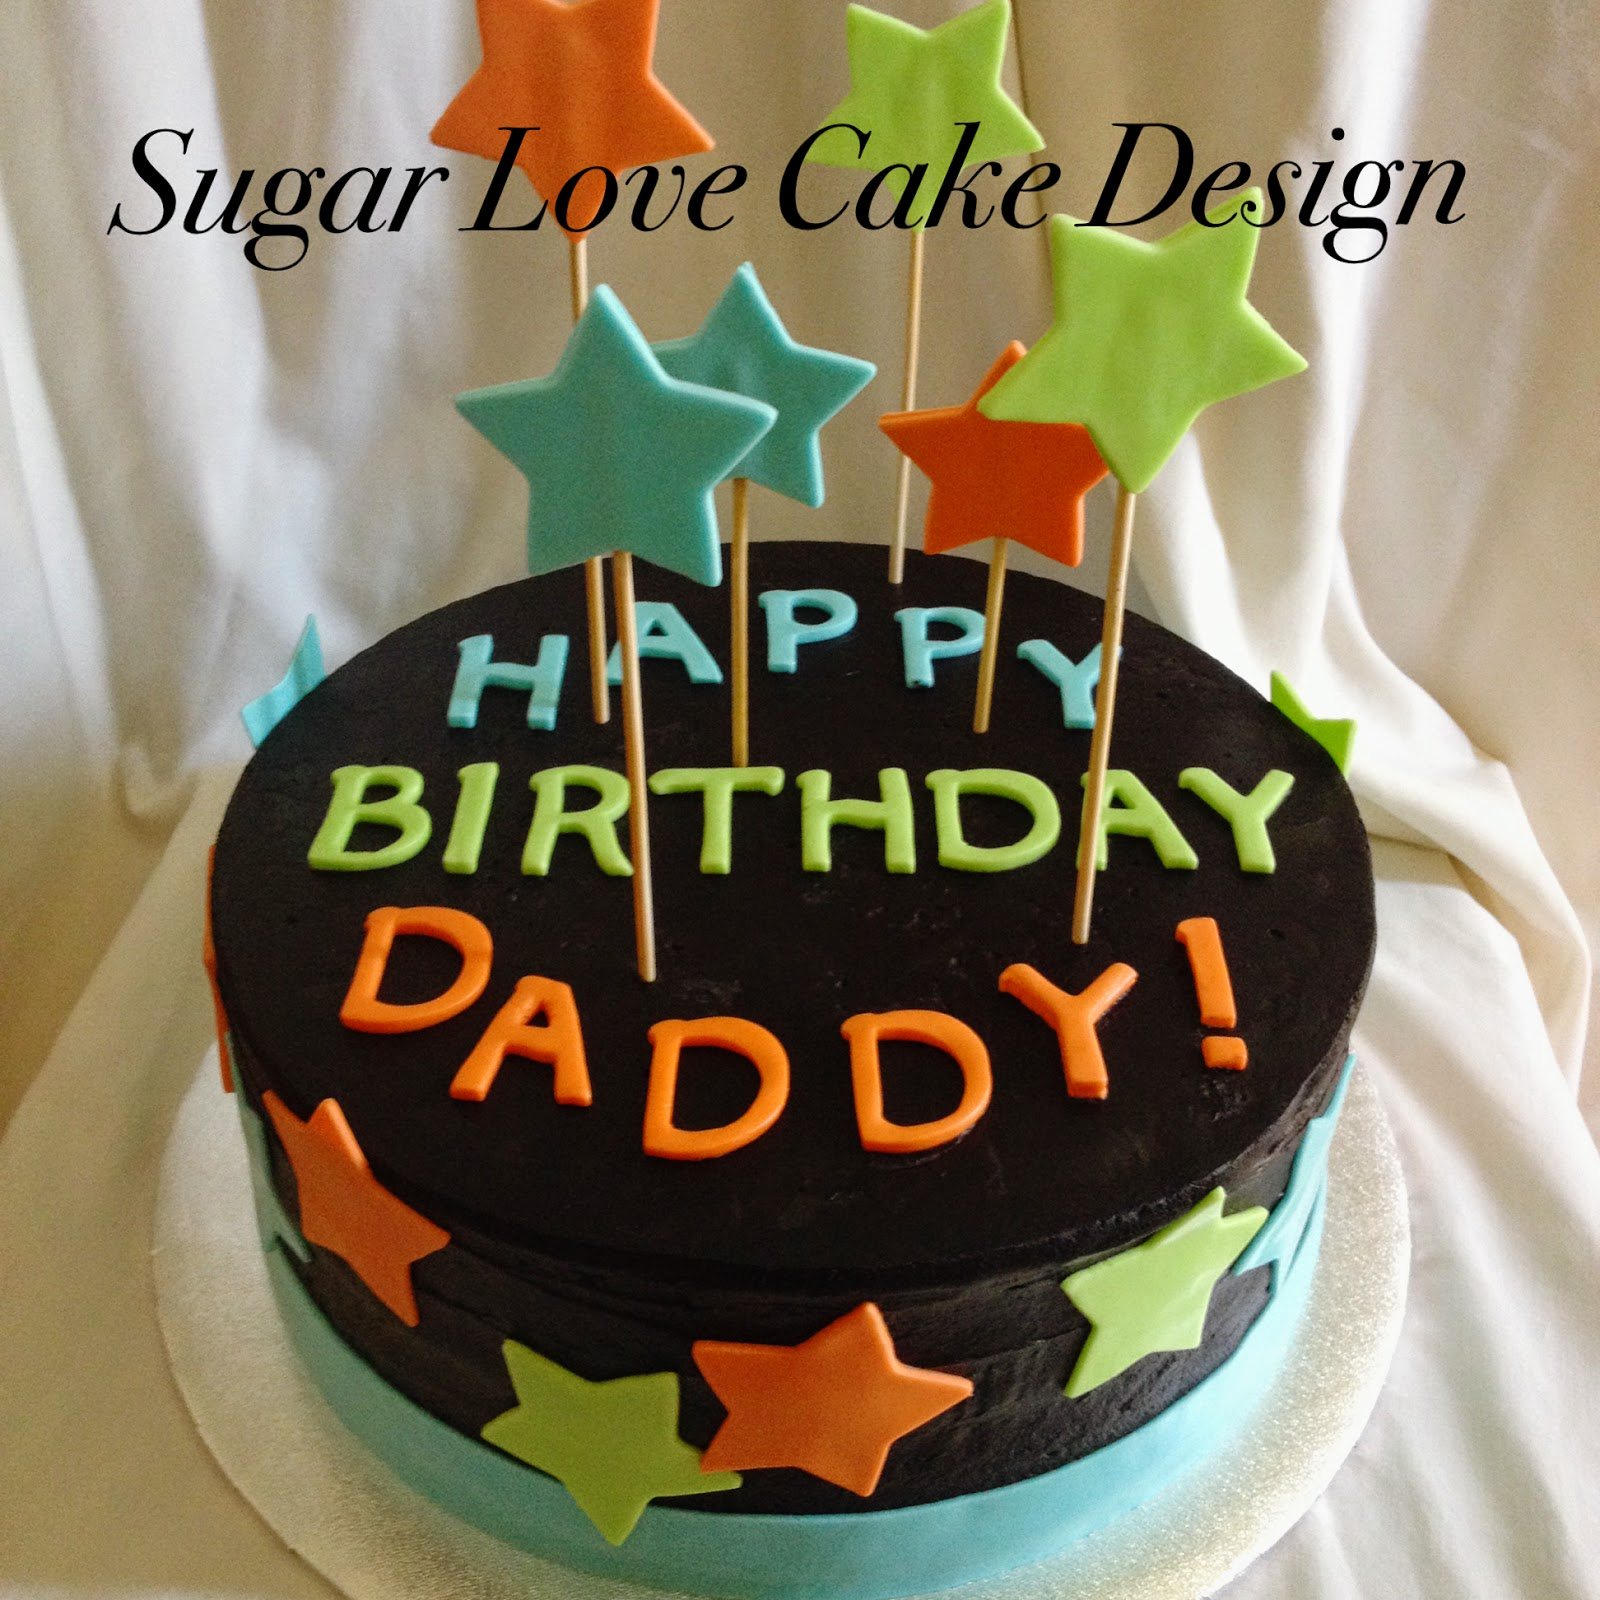 Sugar Love Cake Design